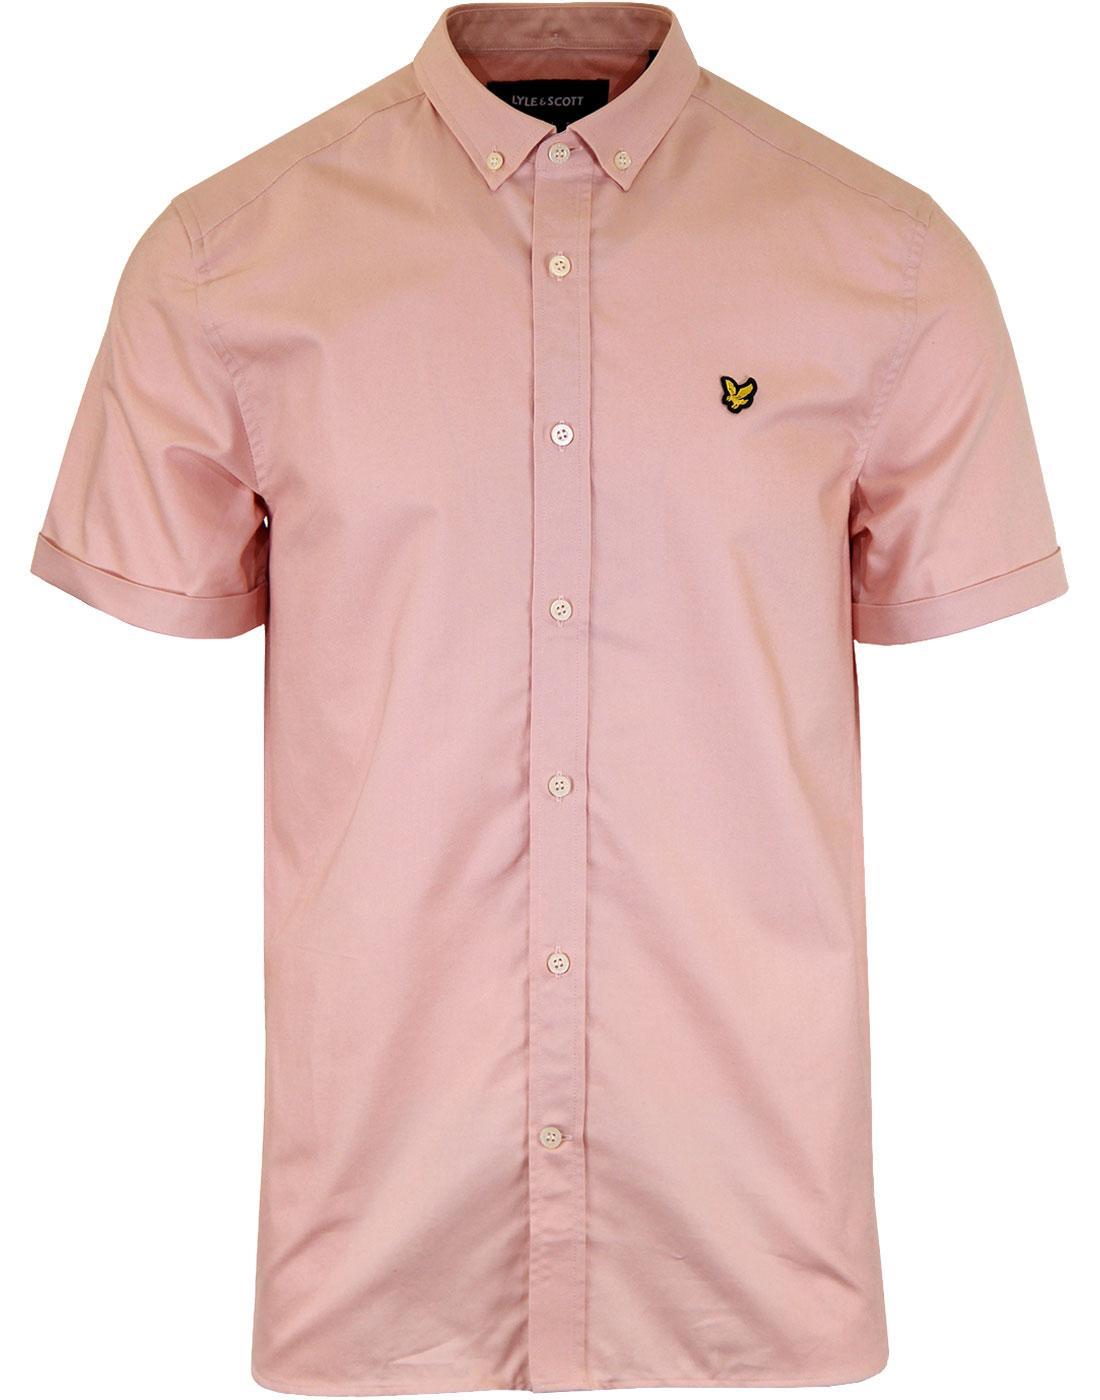 LYLE & SCOTT Mod Button Down SS Oxford Shirt PINK